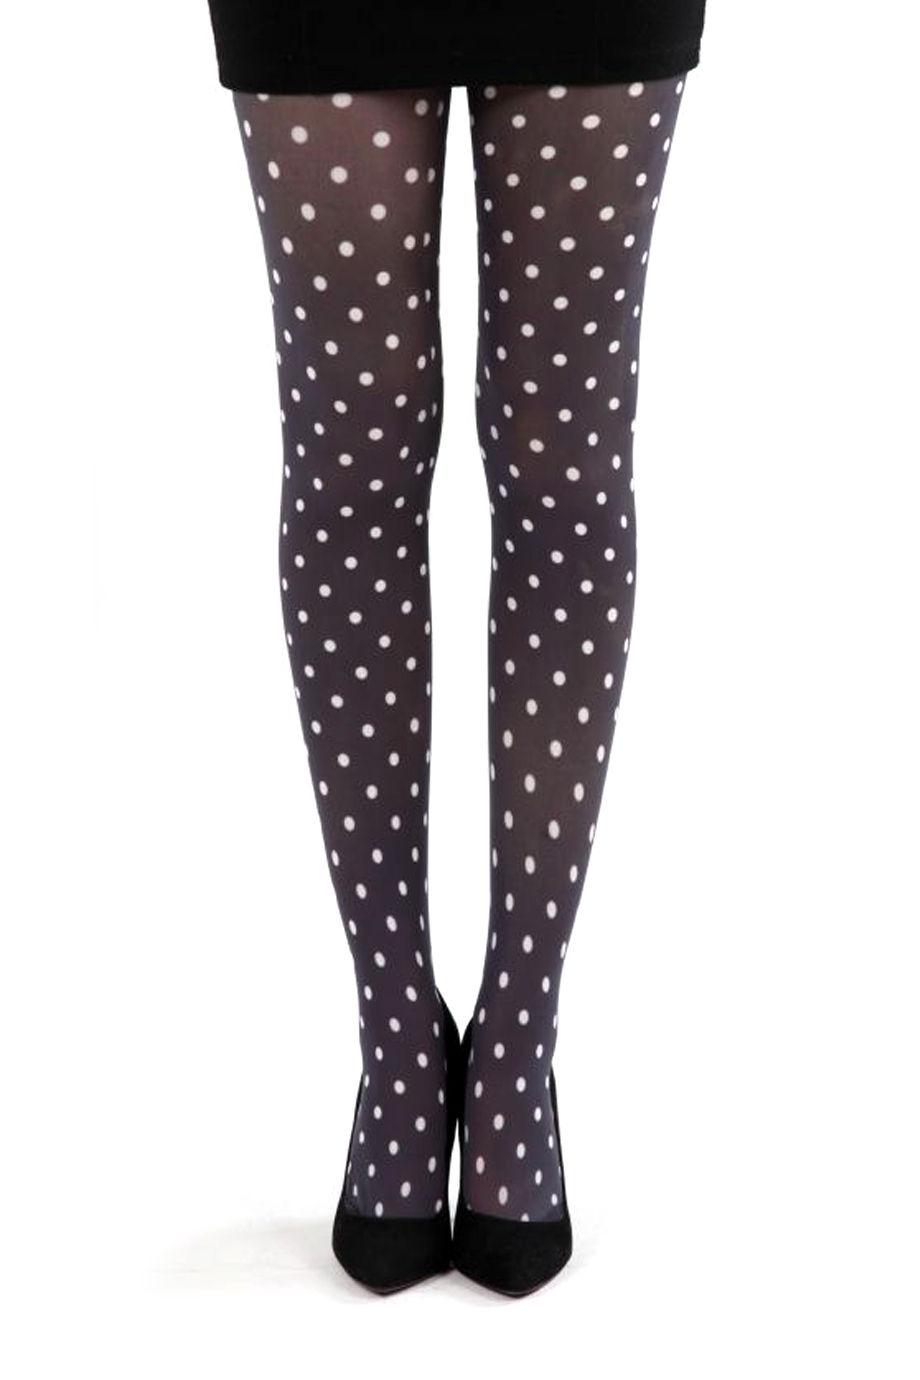 Polka dot B tights black/white